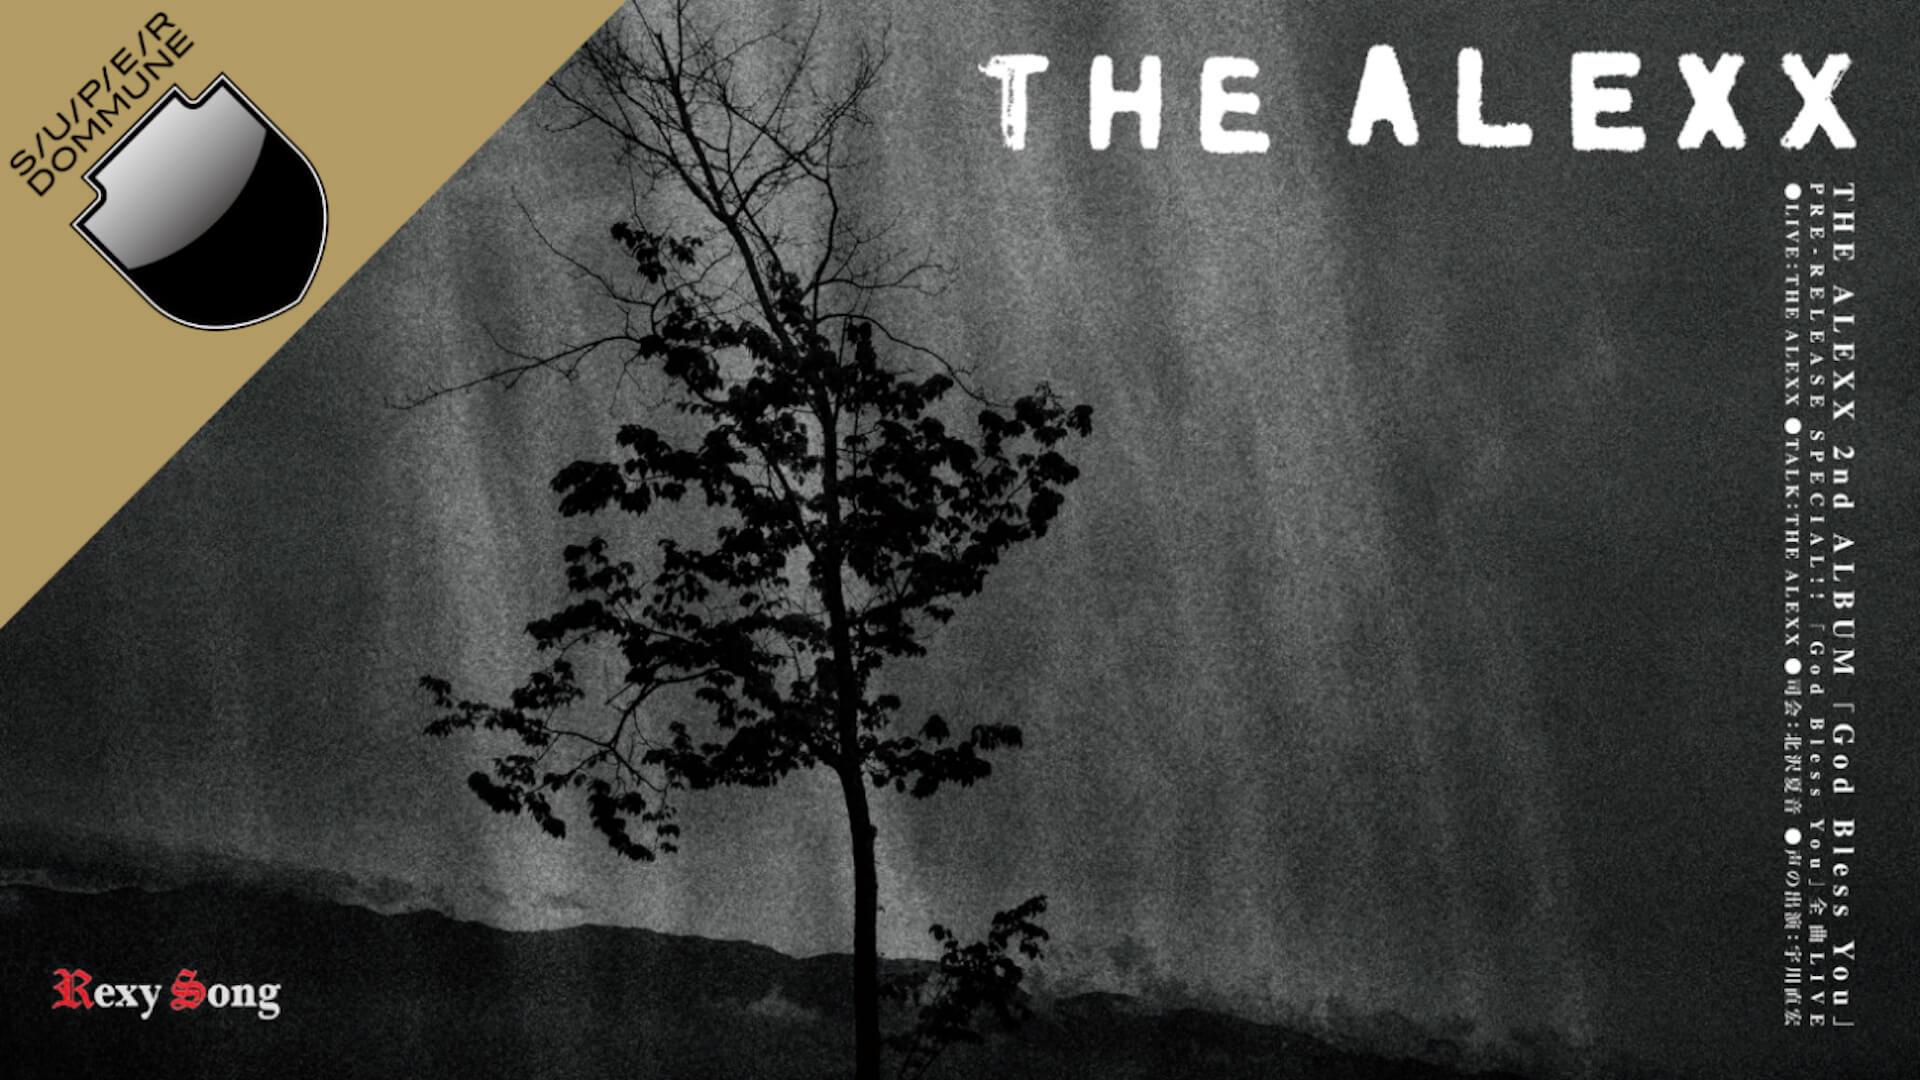 2ndアルバム『God Bless You』をリリースするTHE ALEXXがSUPER DOMMUNEで全曲ライブに挑戦! music210803_thealexx_superdommune_1